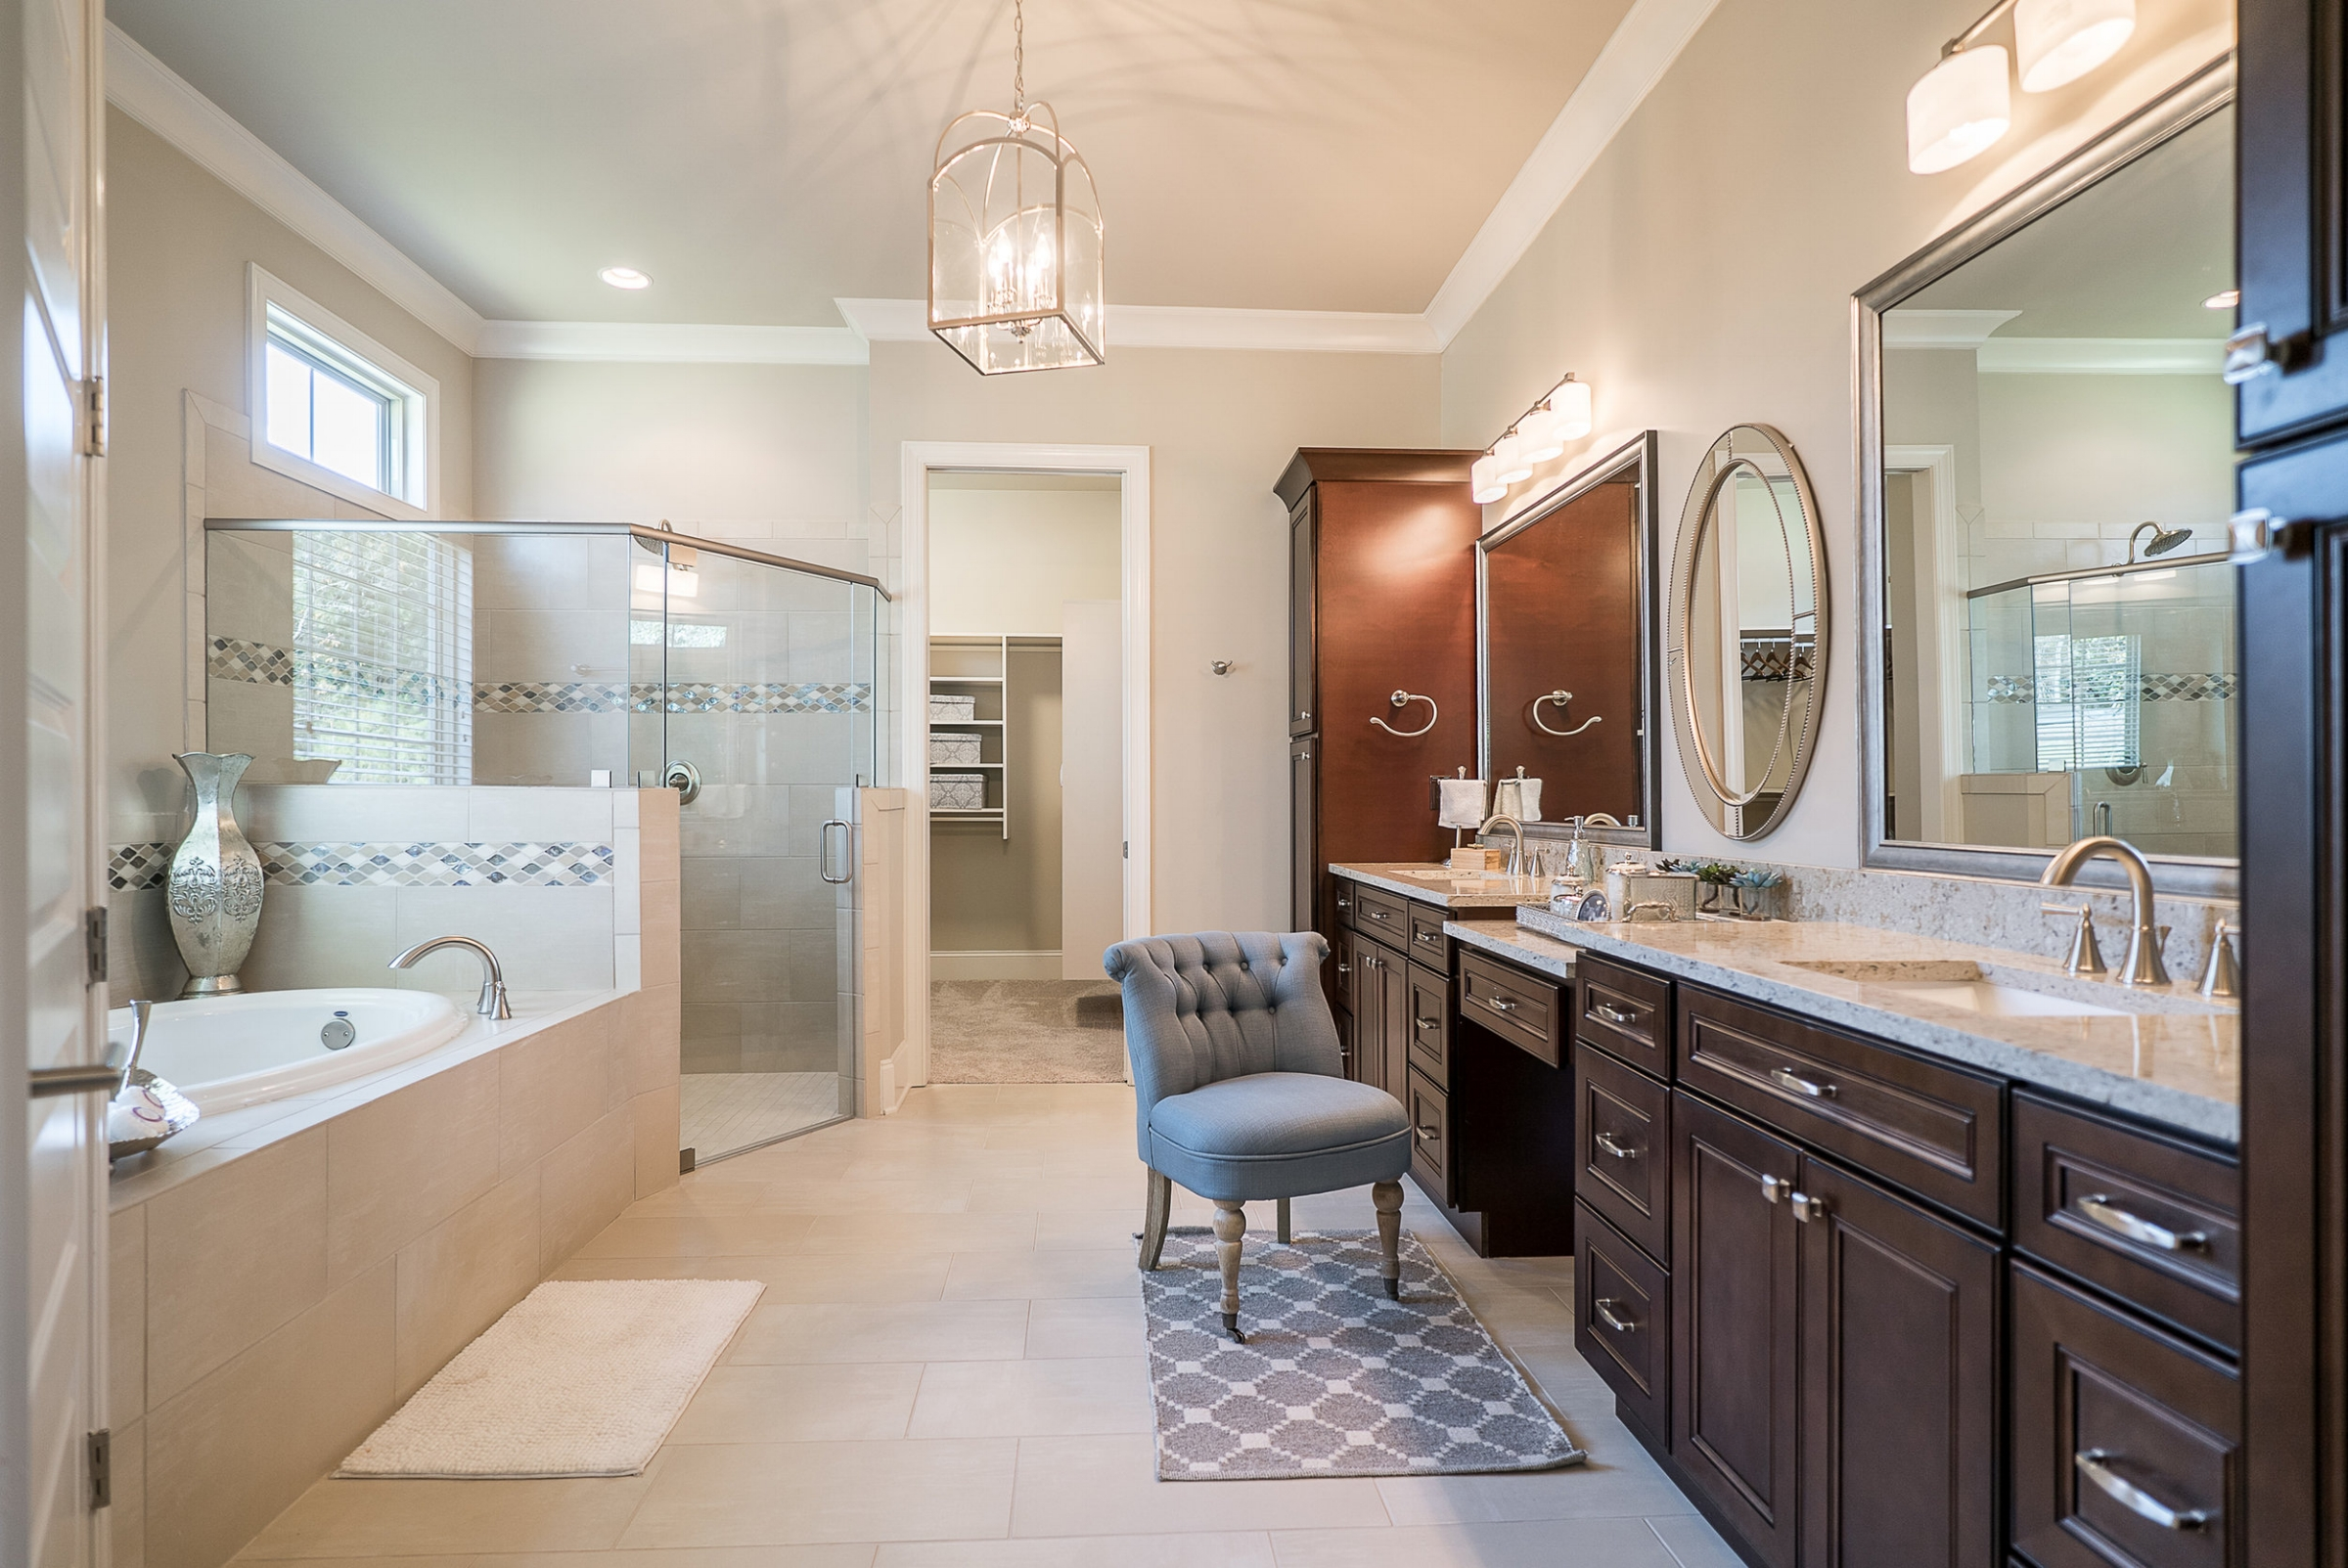 Master Bathroom with Garden Tub